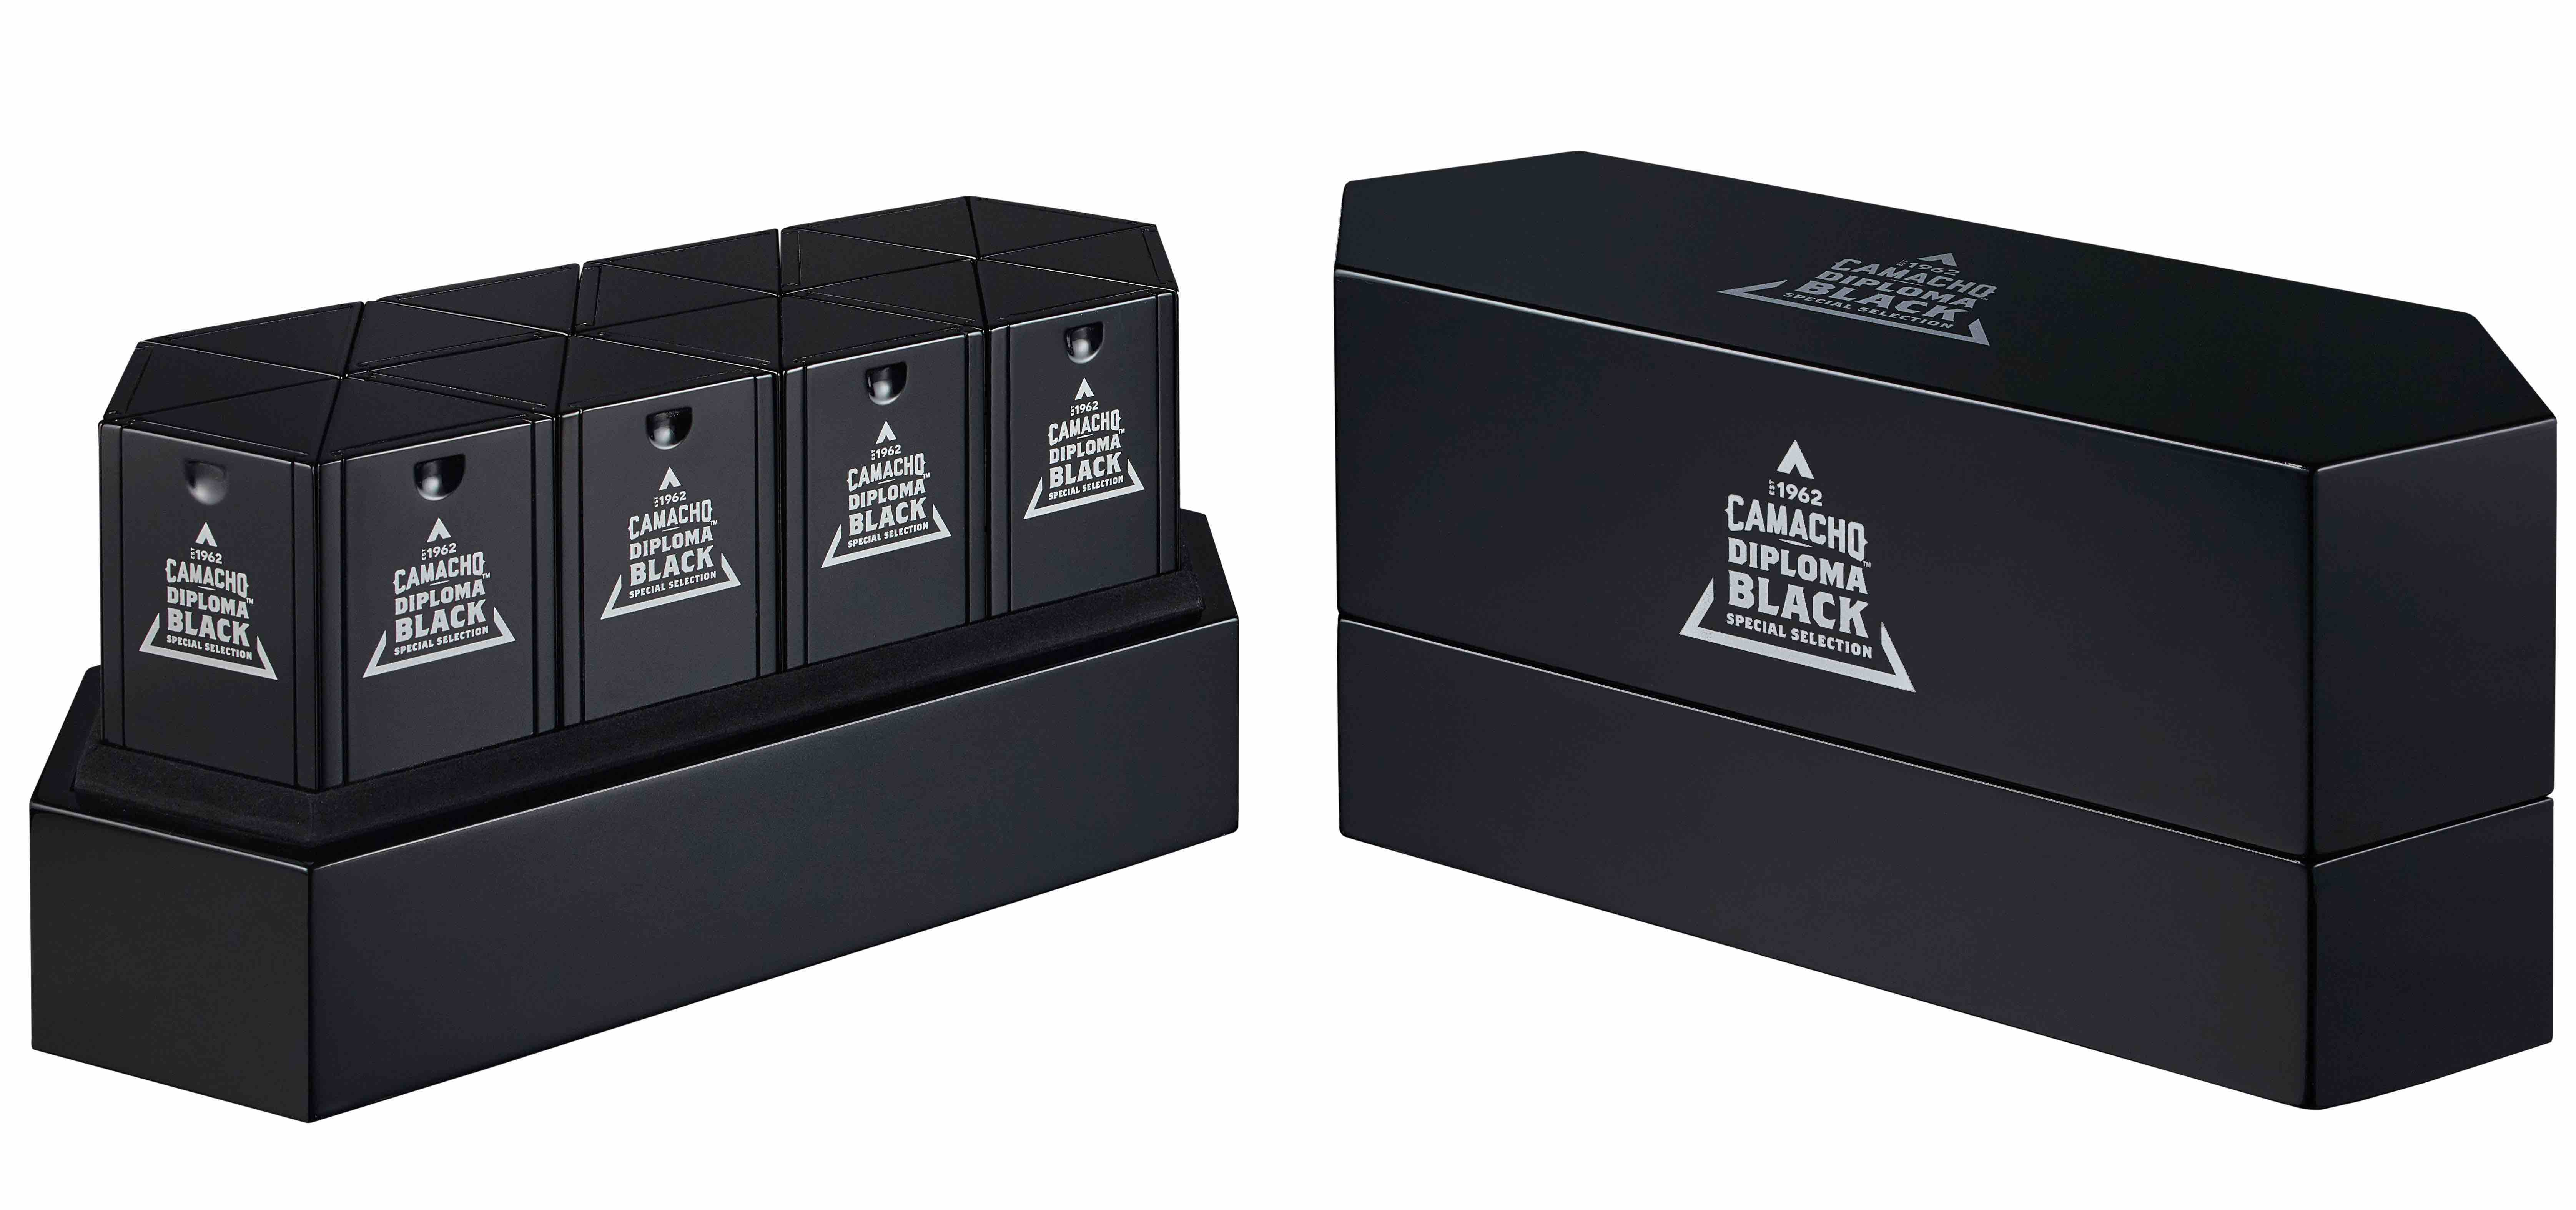 Cigar News: Camacho Special Selection Diploma Black Introduced at 2019 IPCPR